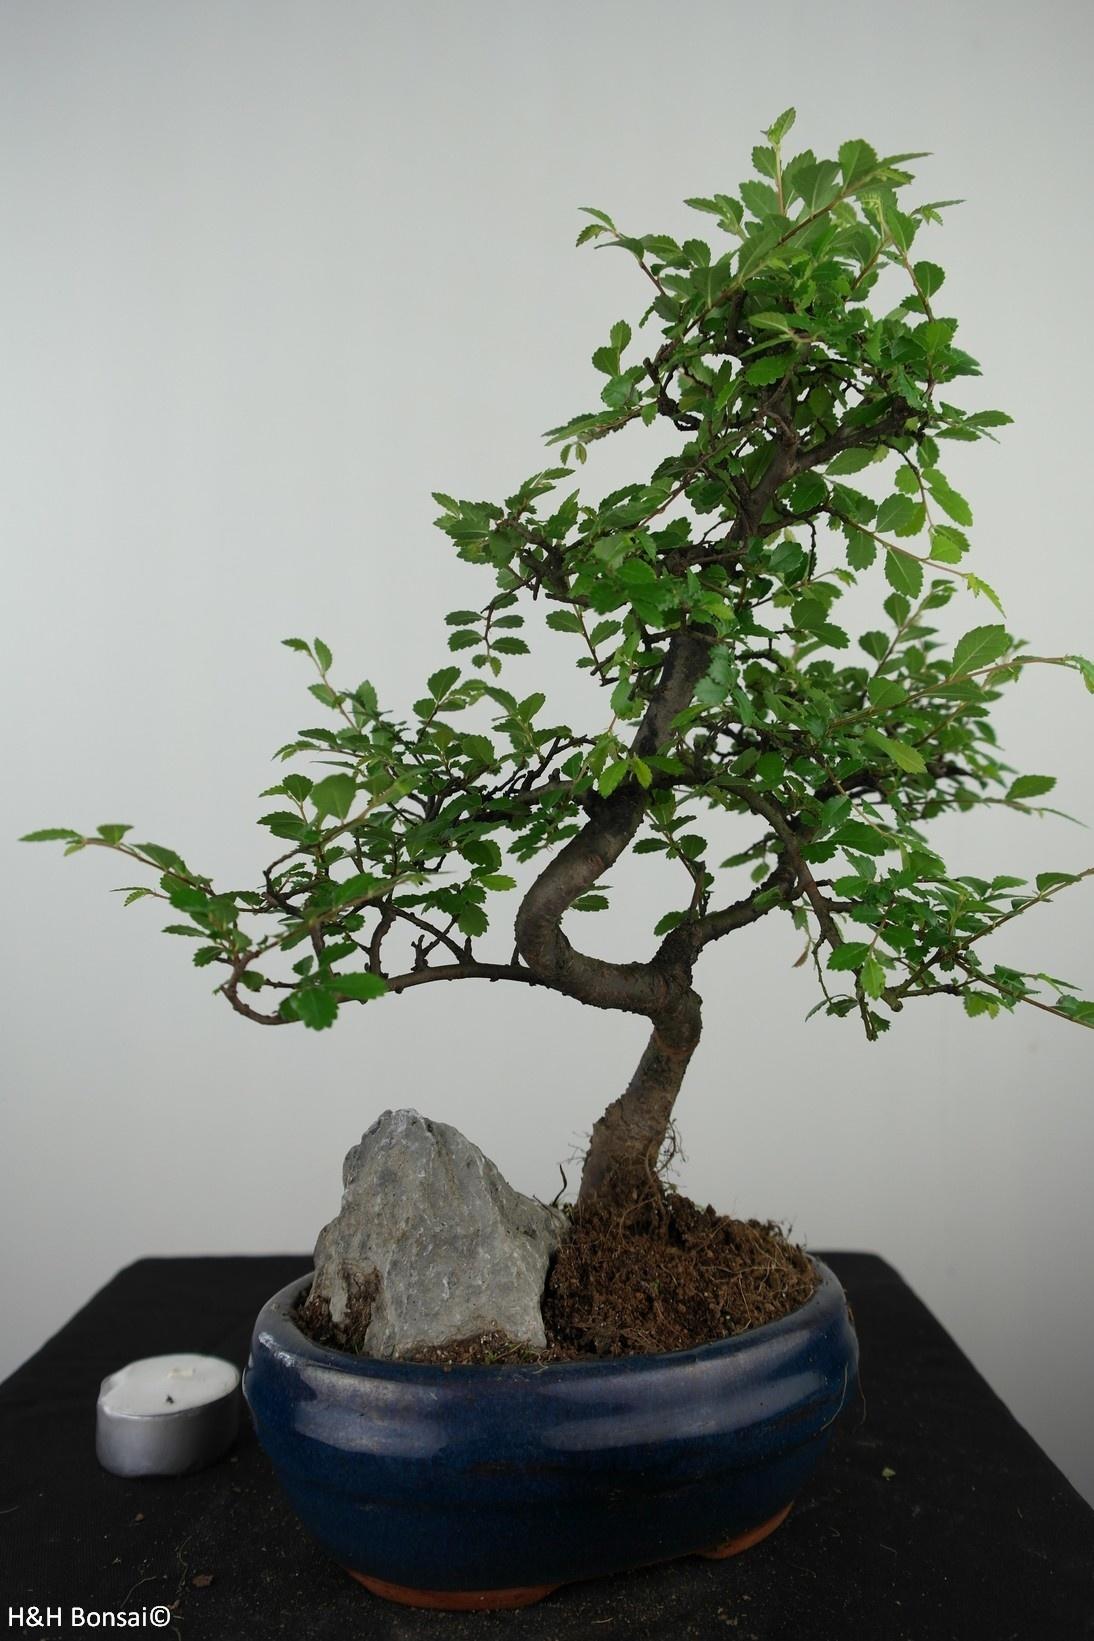 Bonsai Chinese Elm with rock, Ulmus, no. 7611